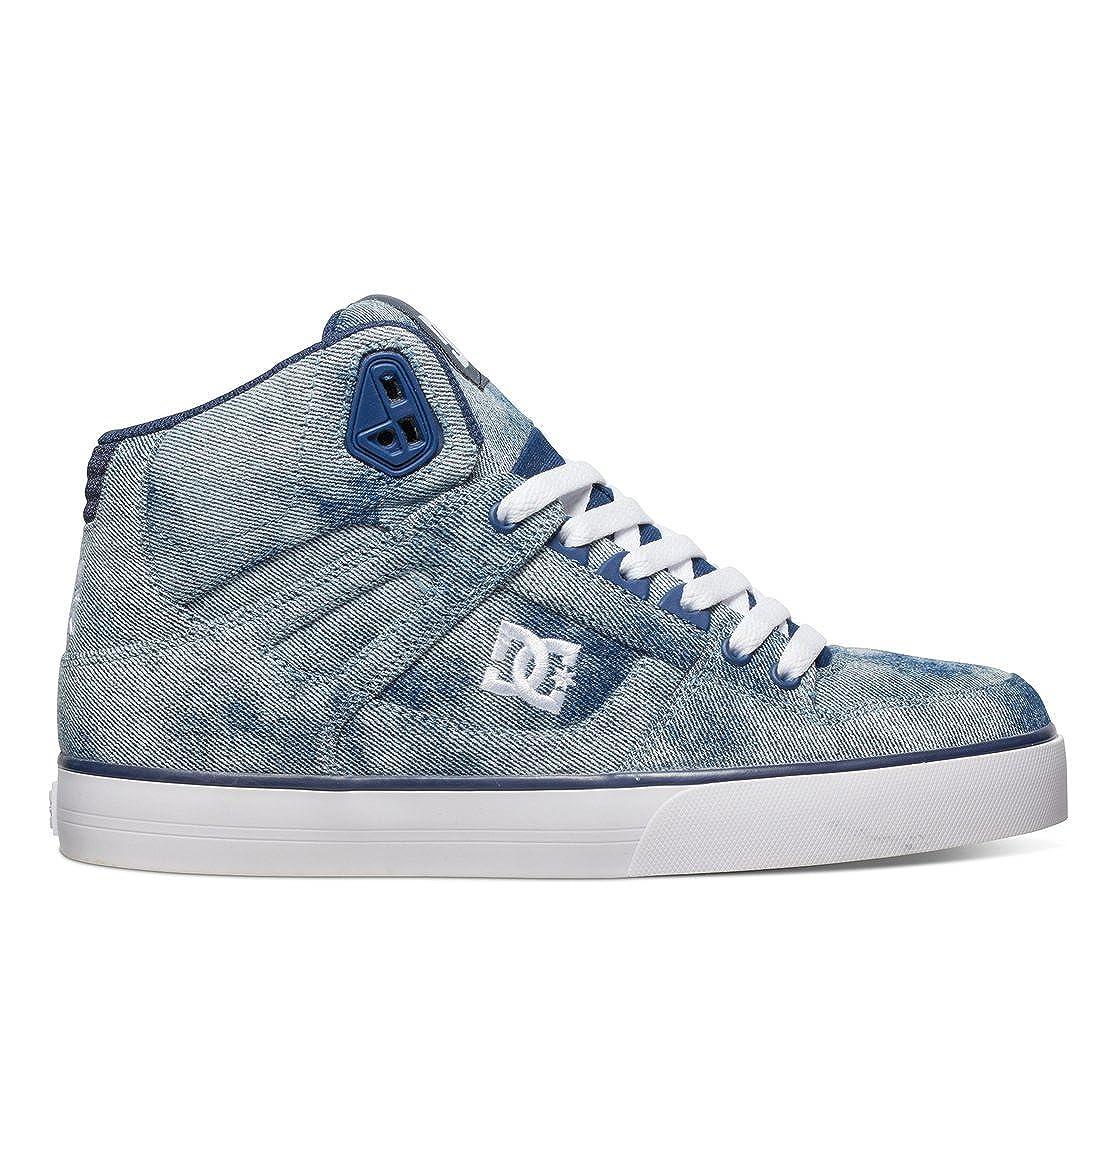 DC Shoes Spartan High WC M Shoe XKKW, Sneaker Uomo